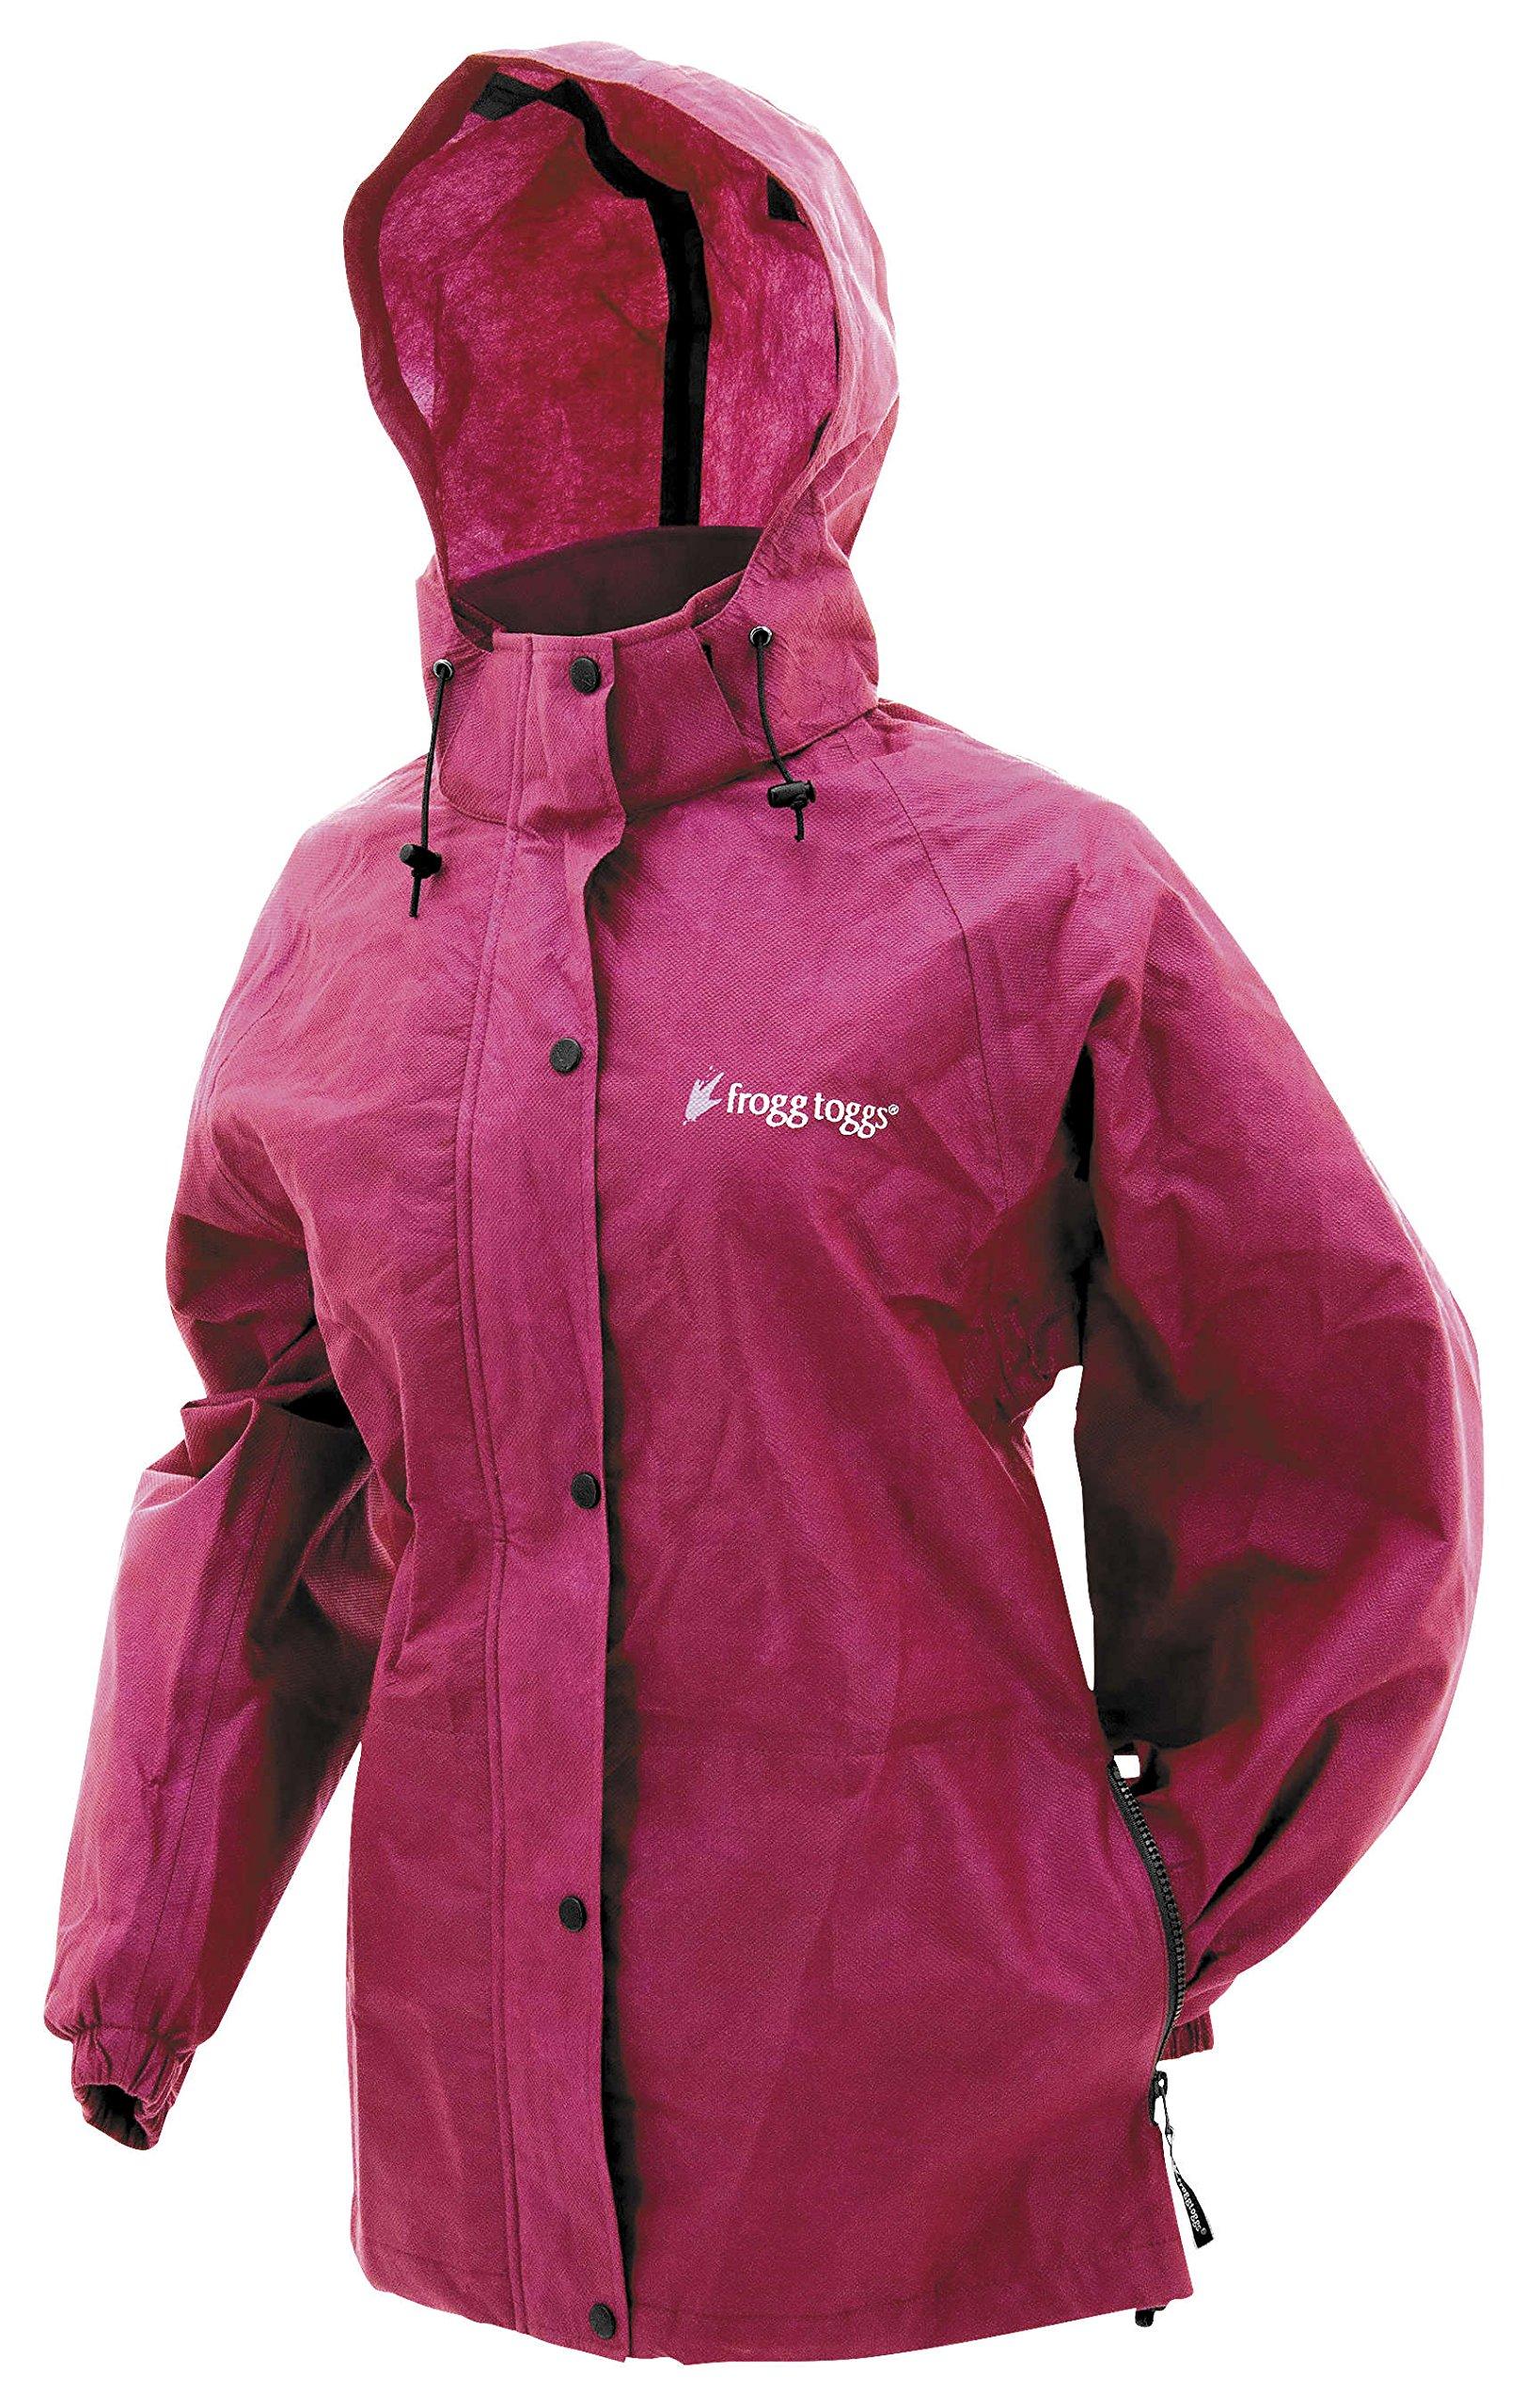 Frogg Toggs PA63523-15-WMD Pro Action Womens Rain Jacket (Cherry, Medium)